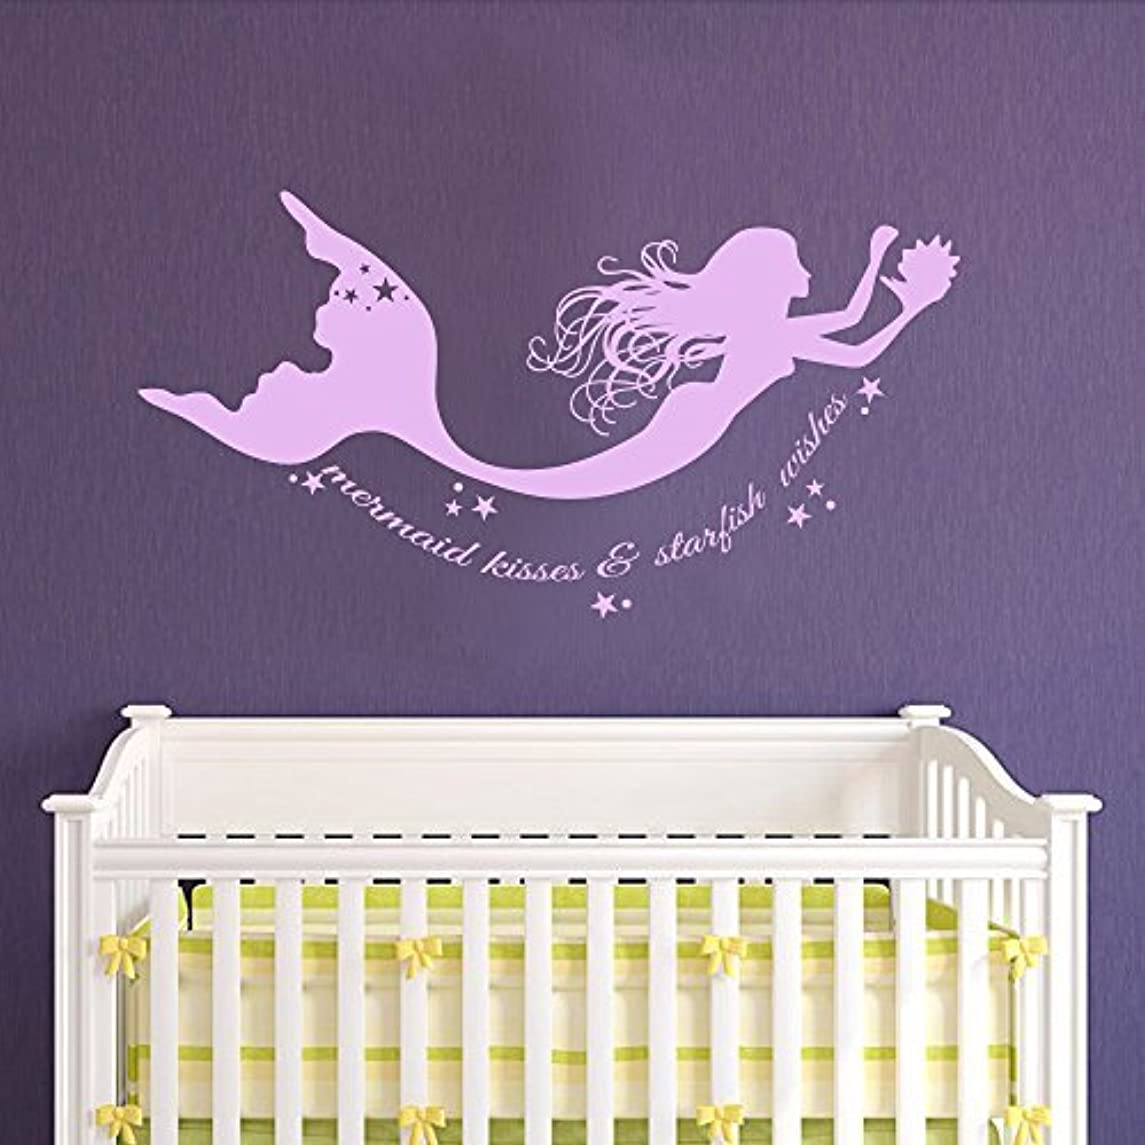 Wall Decal Decor Mermaid Wall Decals Quote Mermaid Kisses & Starfish Wishes Vinyl Decal Sticker Baby Girl Nursery Room Bedding Decor(hydrangea purple, 11.5